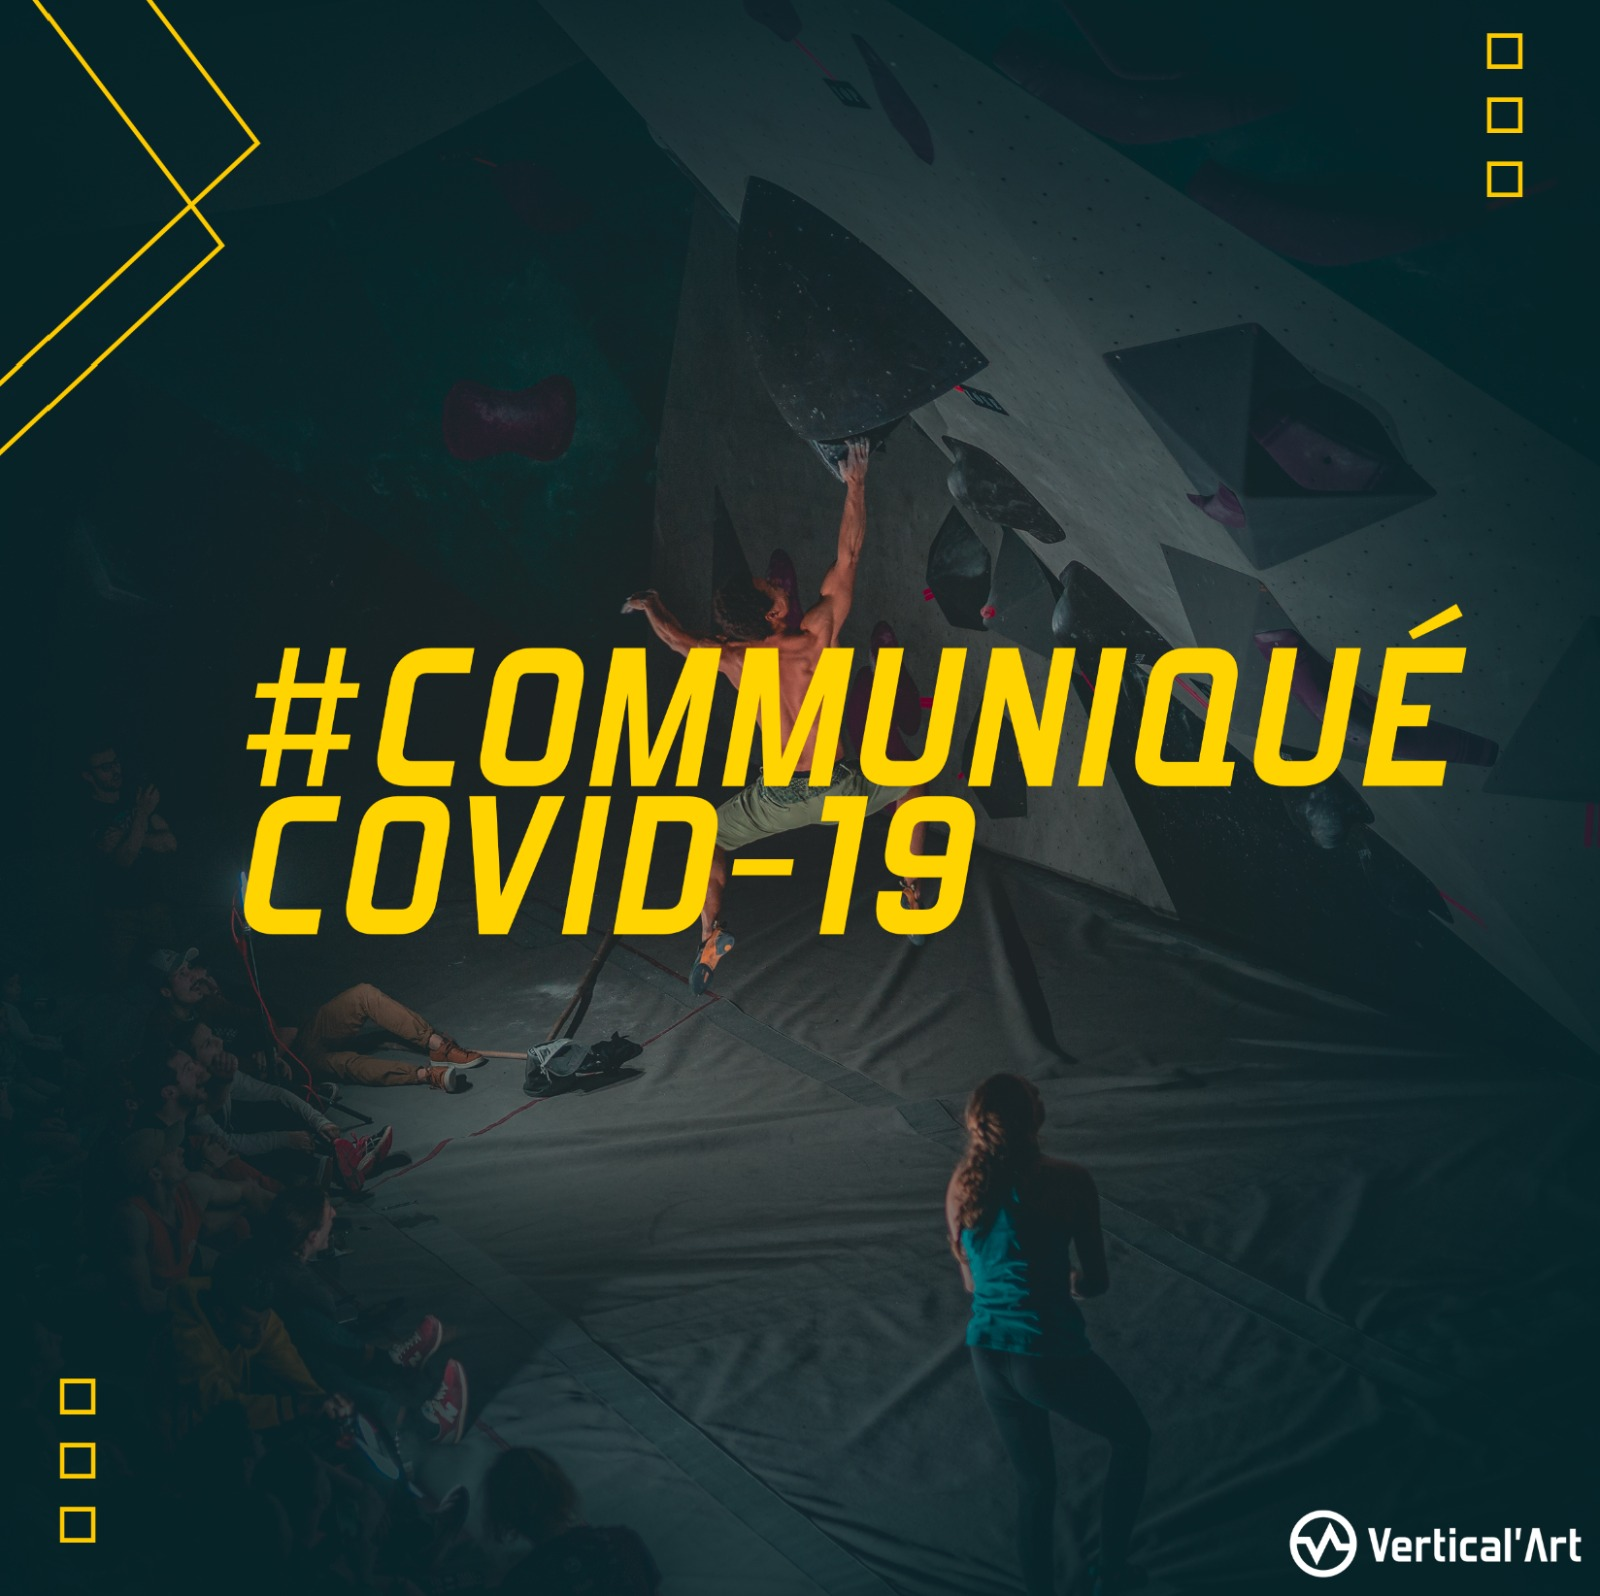 communiqué Covid-19, fermeture de vos salles d'escalade Vertical'Art